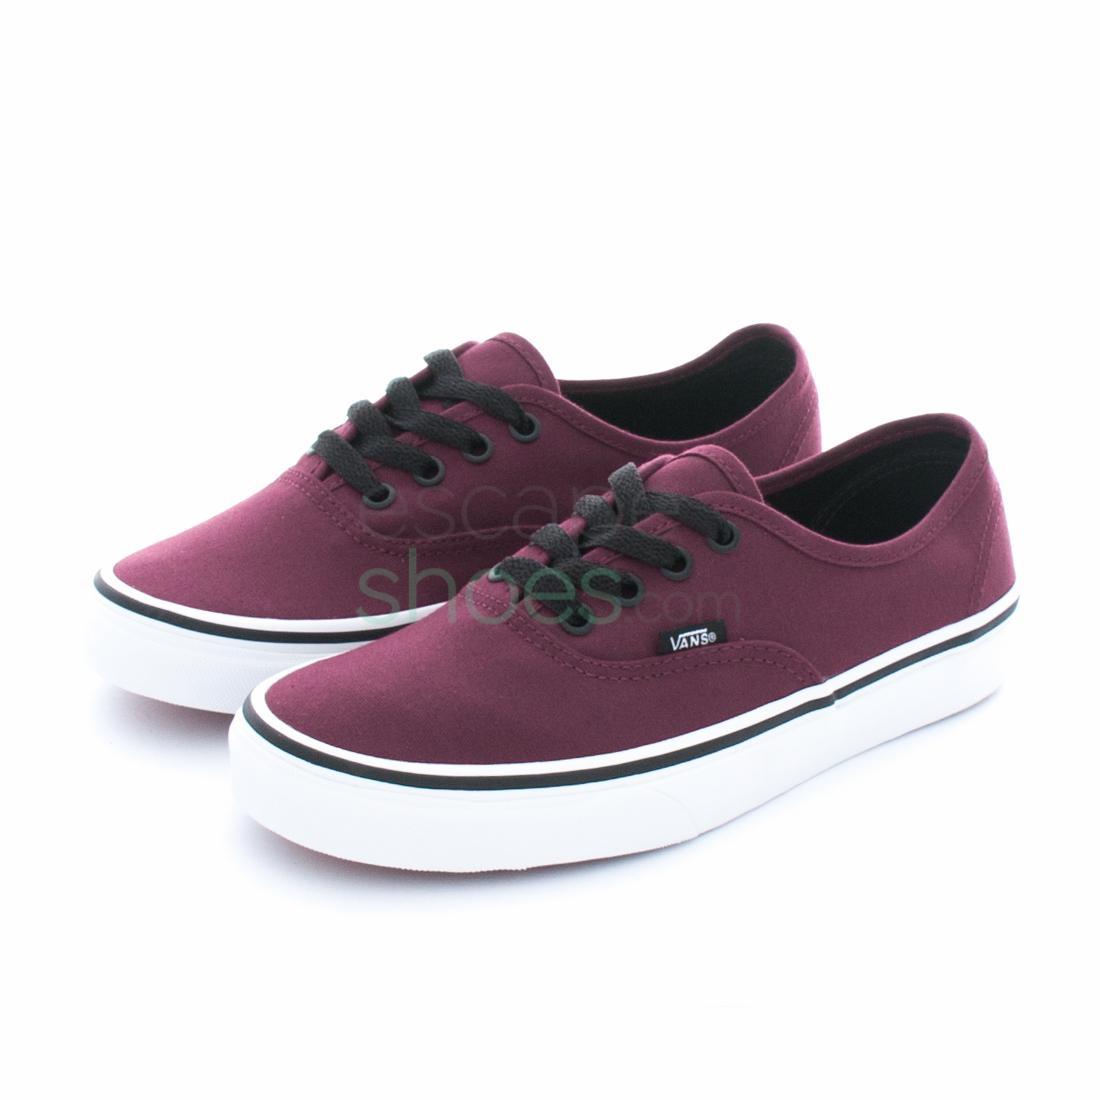 fed03f0540ba Buy your Sneakers VANS Authentic Port Royale Black VQER5U8 here ...